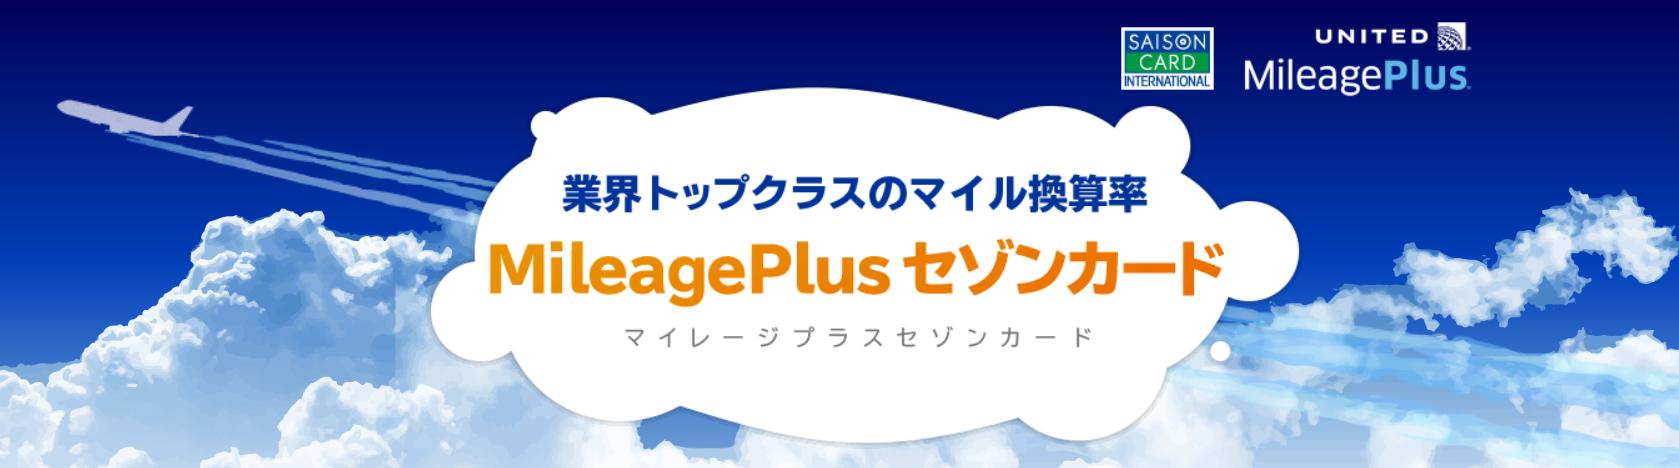 MileagePlusセゾンカードは業界トップクラスのマイル換算率